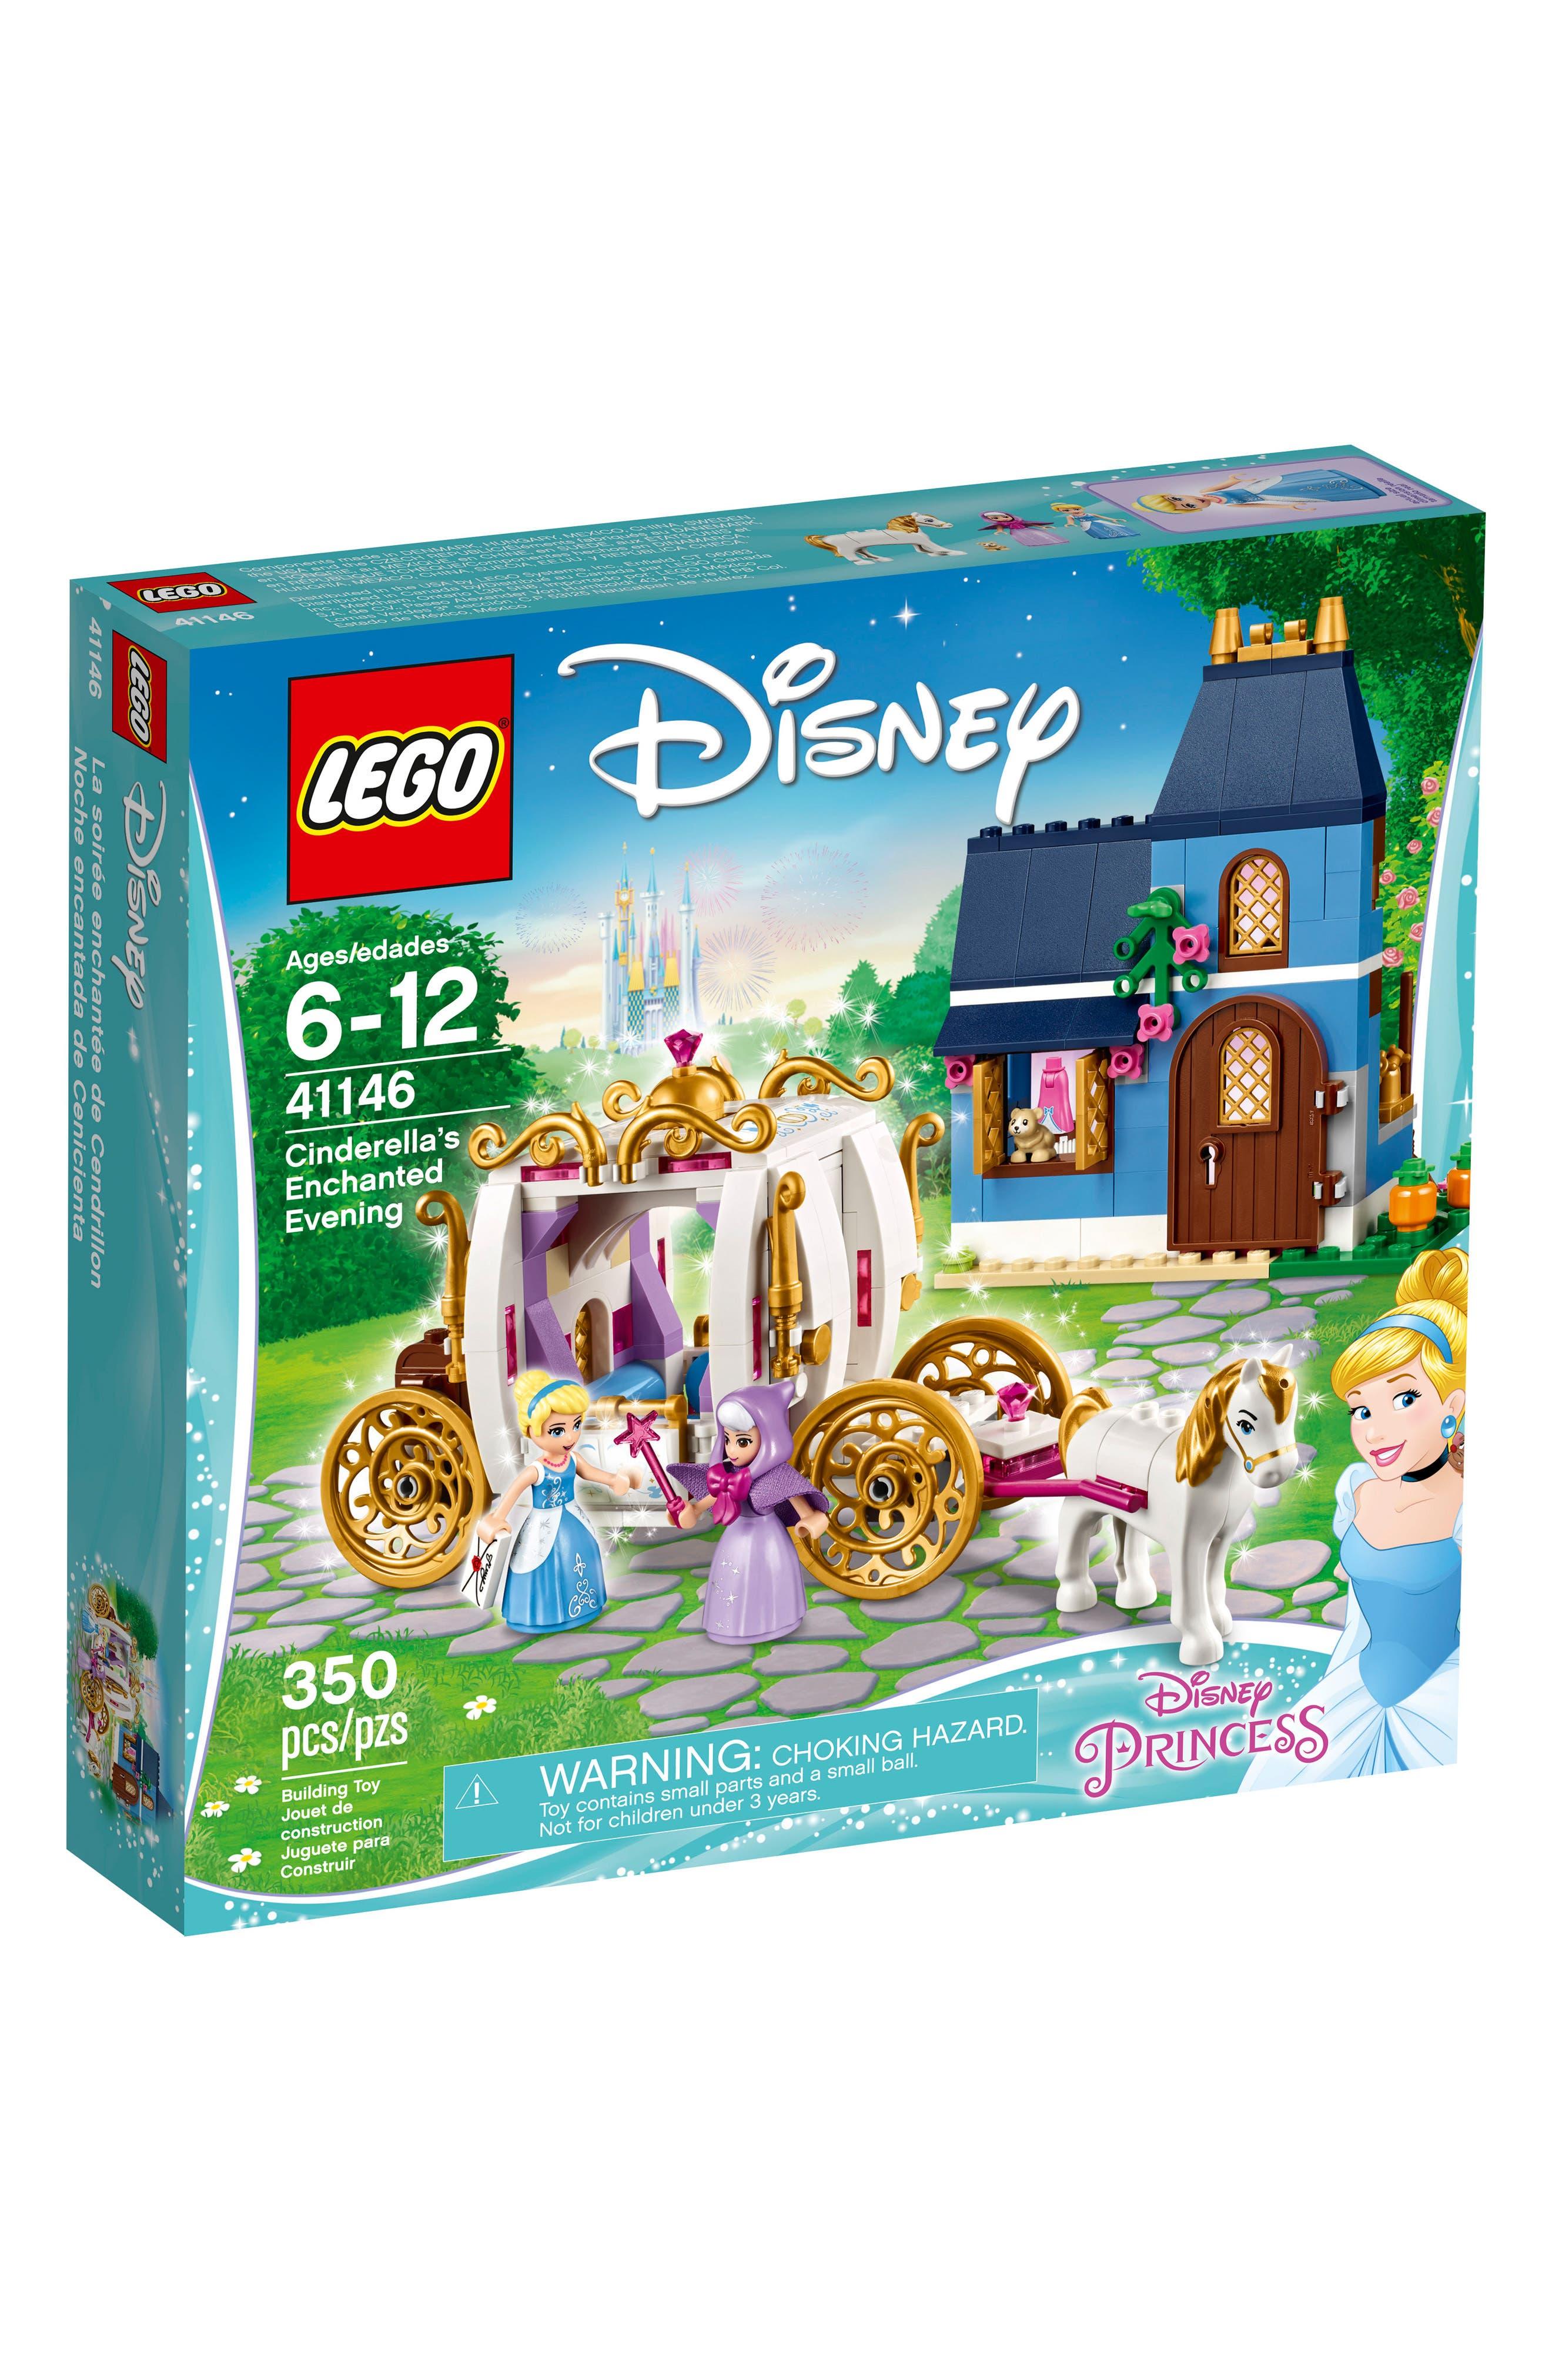 Disney<sup>™</sup> Cinderella's Enchanted Evening Play Set - 41146,                         Main,                         color, Multi